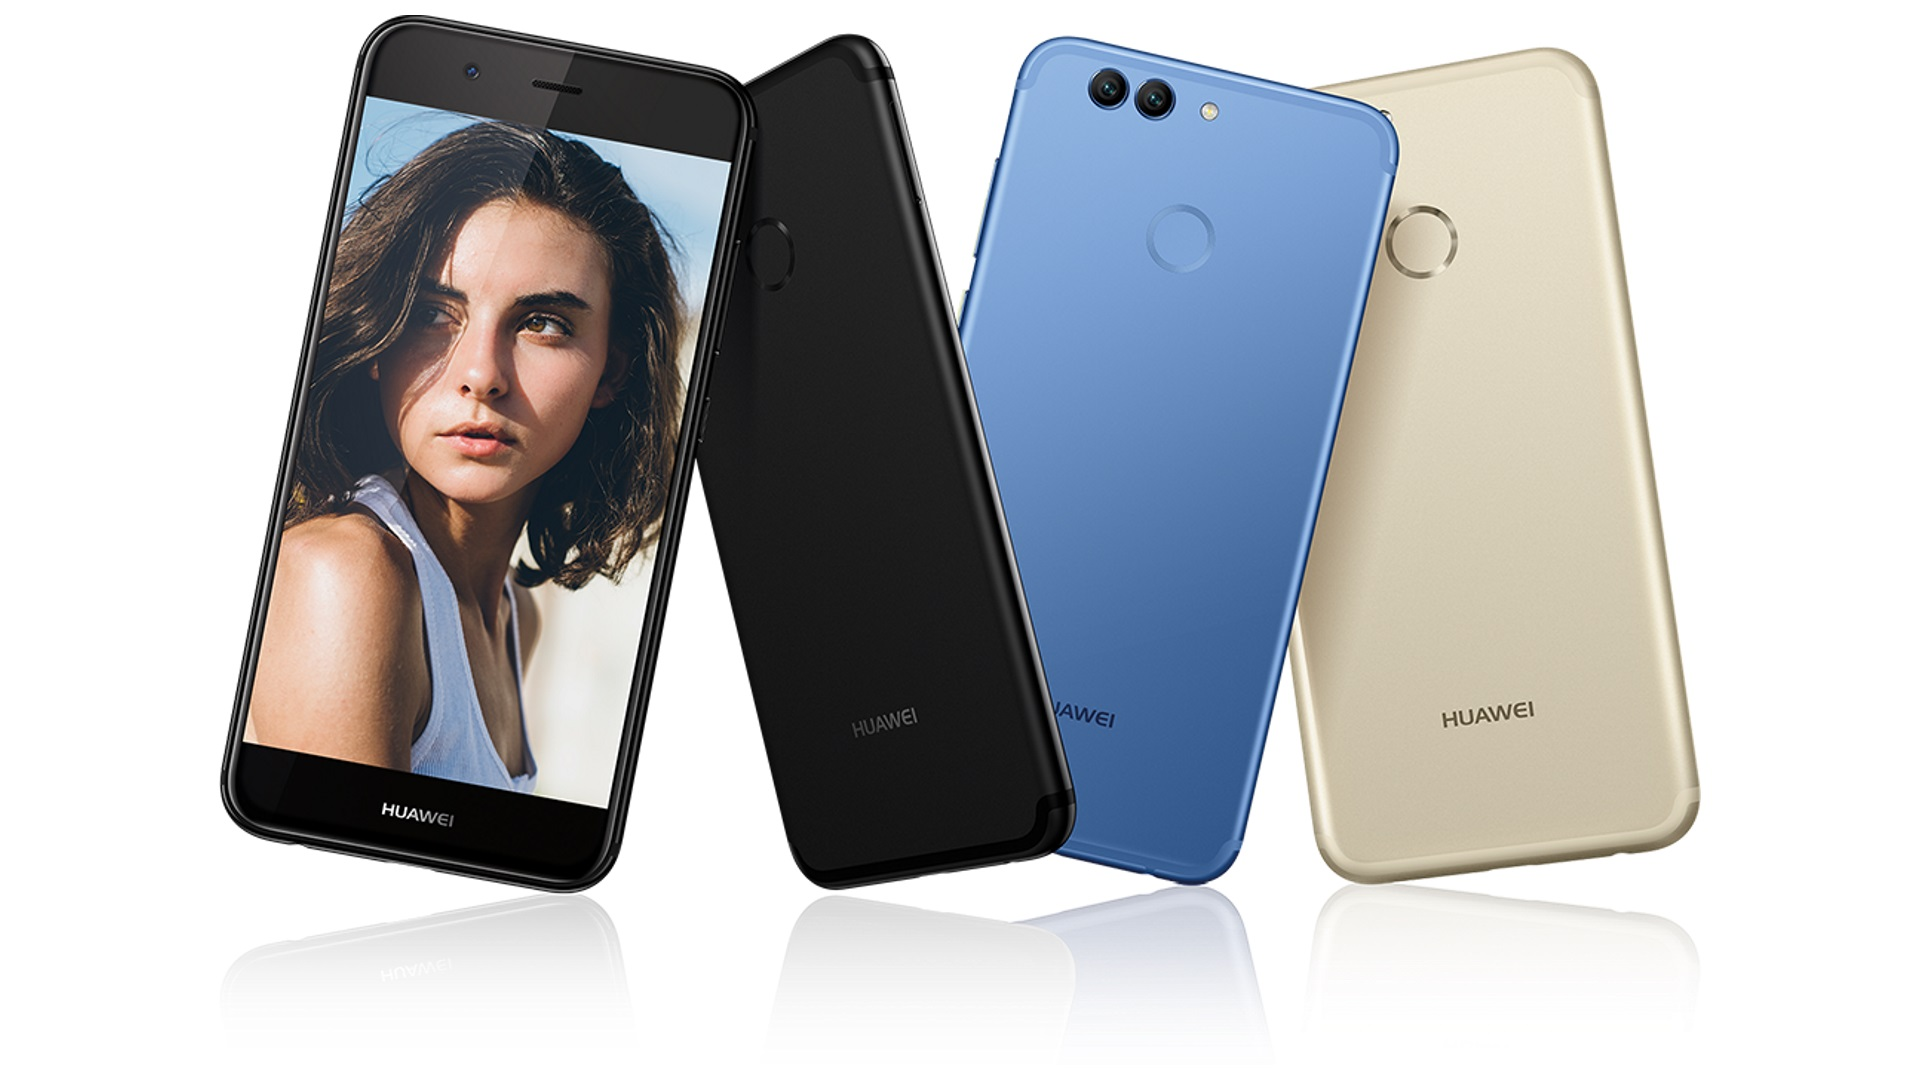 1ShopMobileが「Huawei nova 2 Plus」を発売